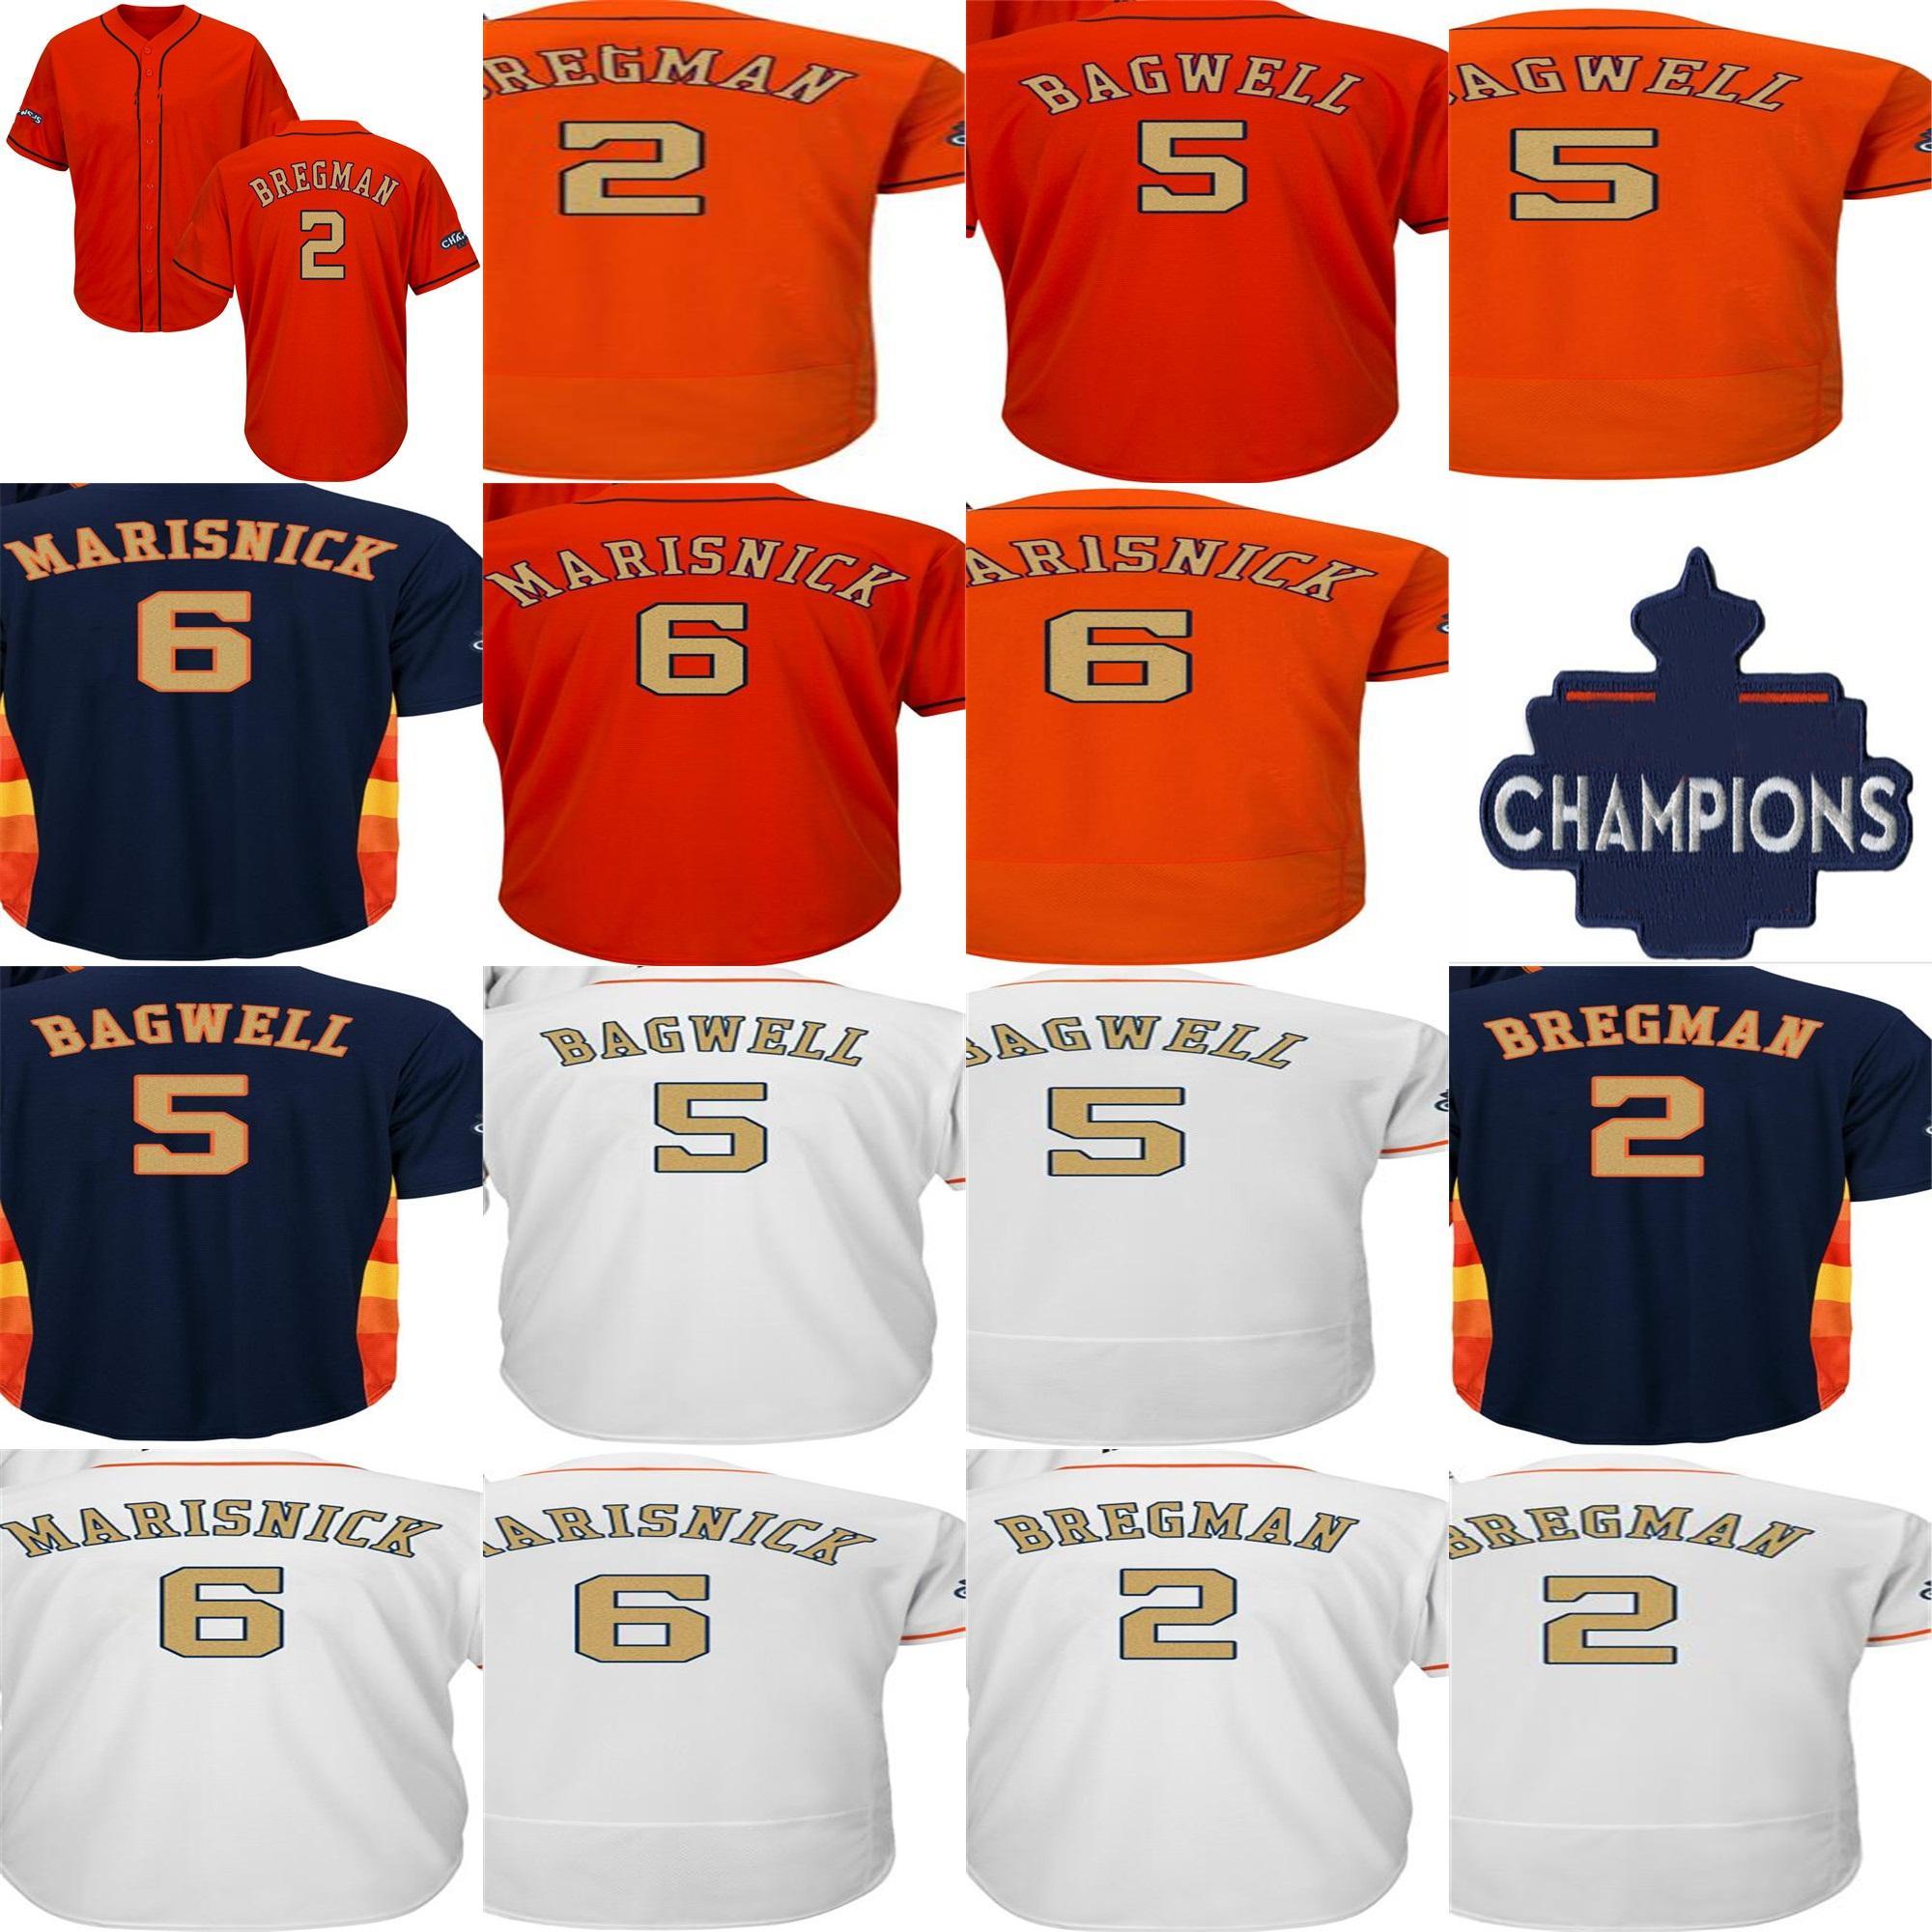 9ce559d4e Alex Bregman 5 Jeff Bagwell 6 Jake Marisnick Mens Womens Kids 2018 Gold  Program Houston 2017 WS Champion Patch Cool Flex Baseball Jerseys Sports  Jerseys ...